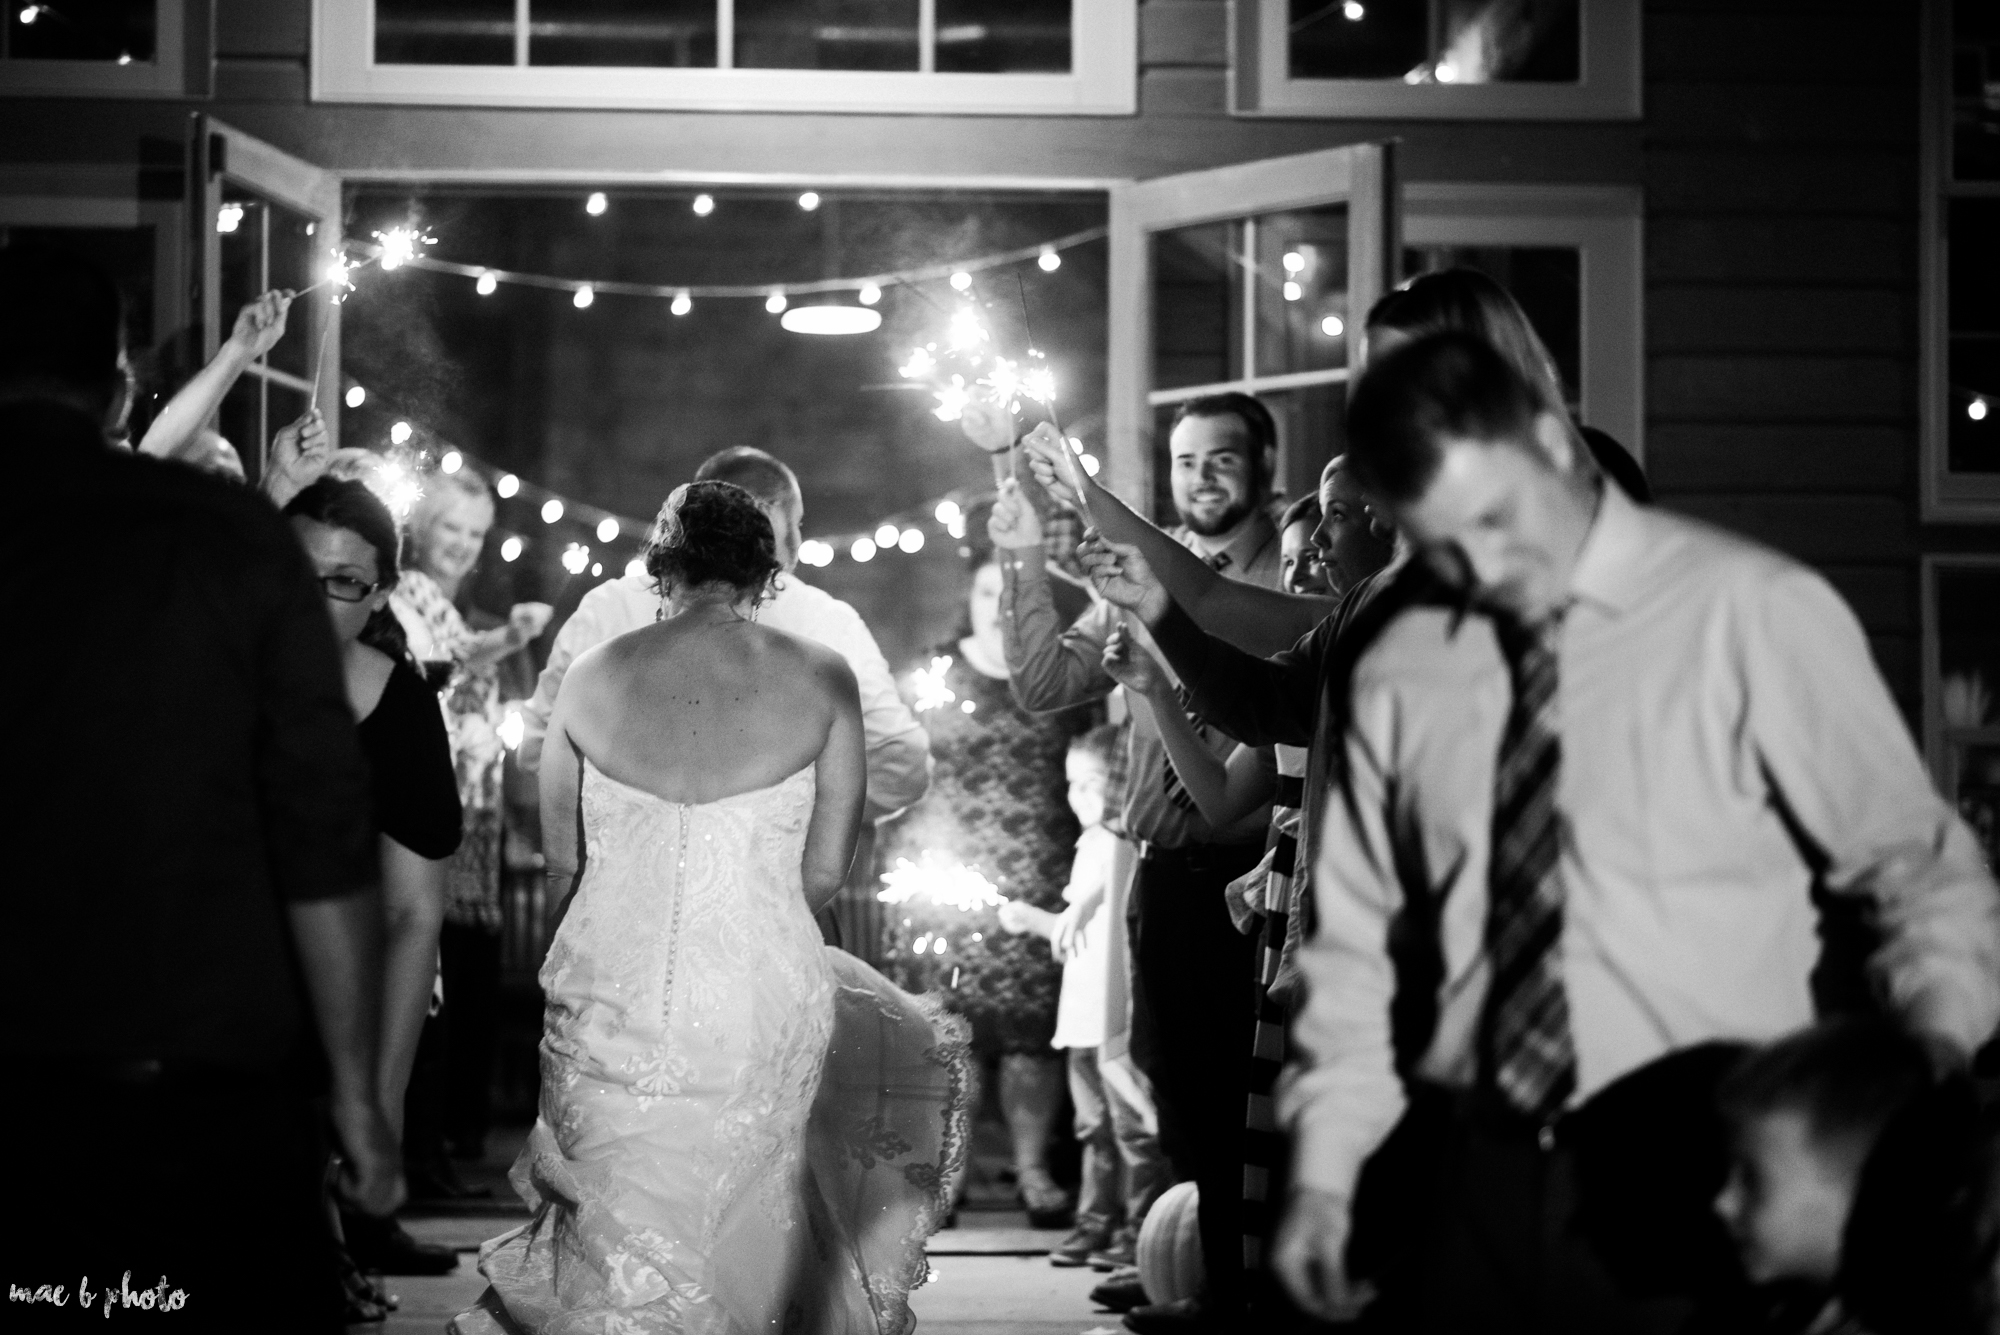 Sarah & Dustin's Rustic Chic Barn Wedding at Hartford Hill Winery in Hartford, Ohio by Mae B Photo-112.jpg